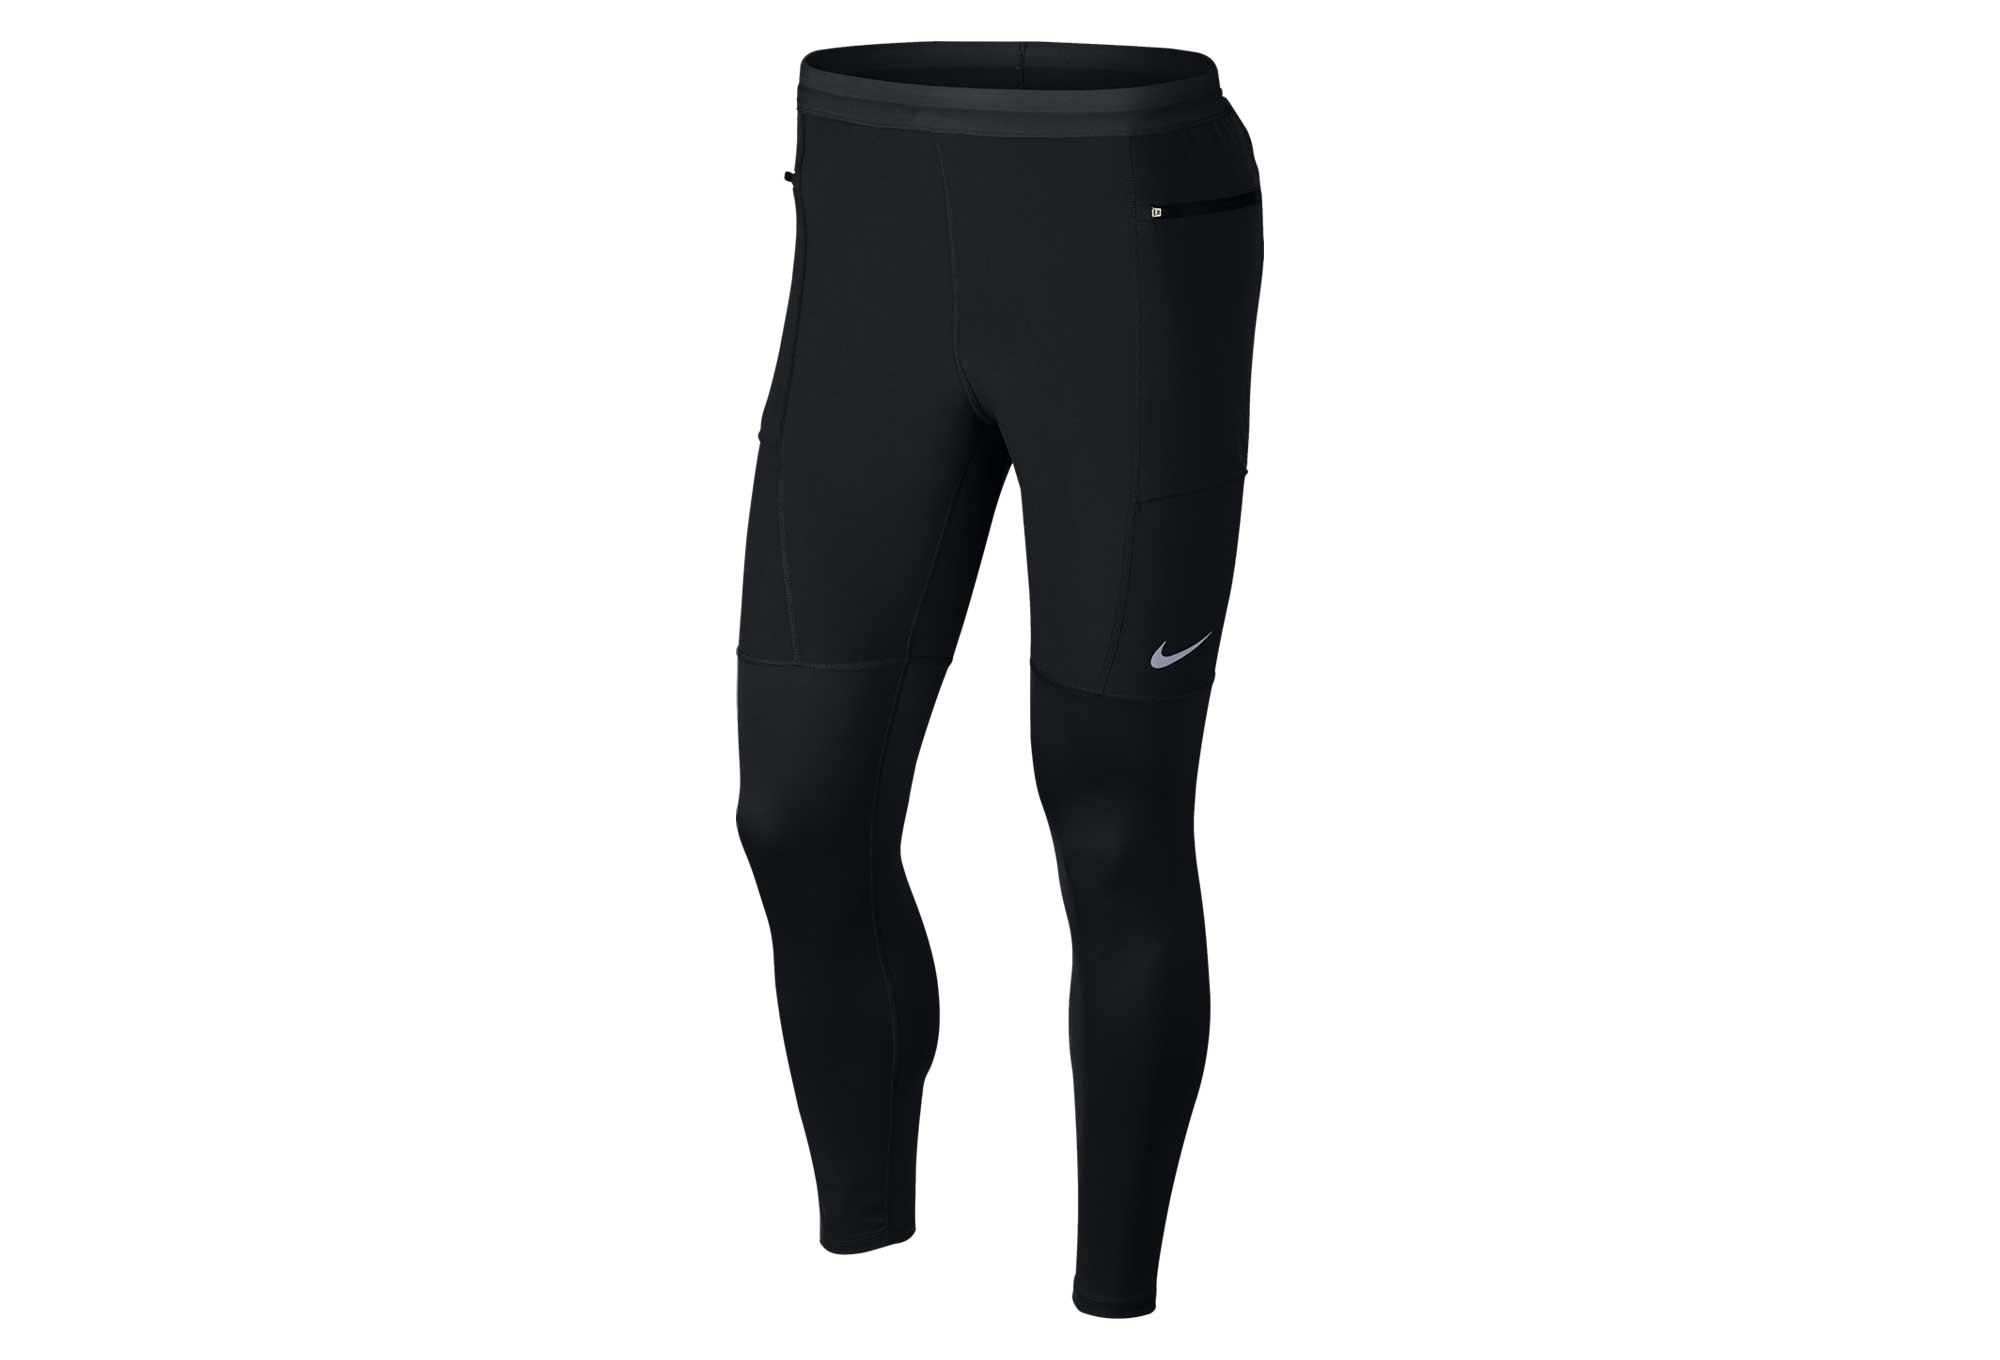 Pantalon De Nike Sport Noir Running 7T7prqw